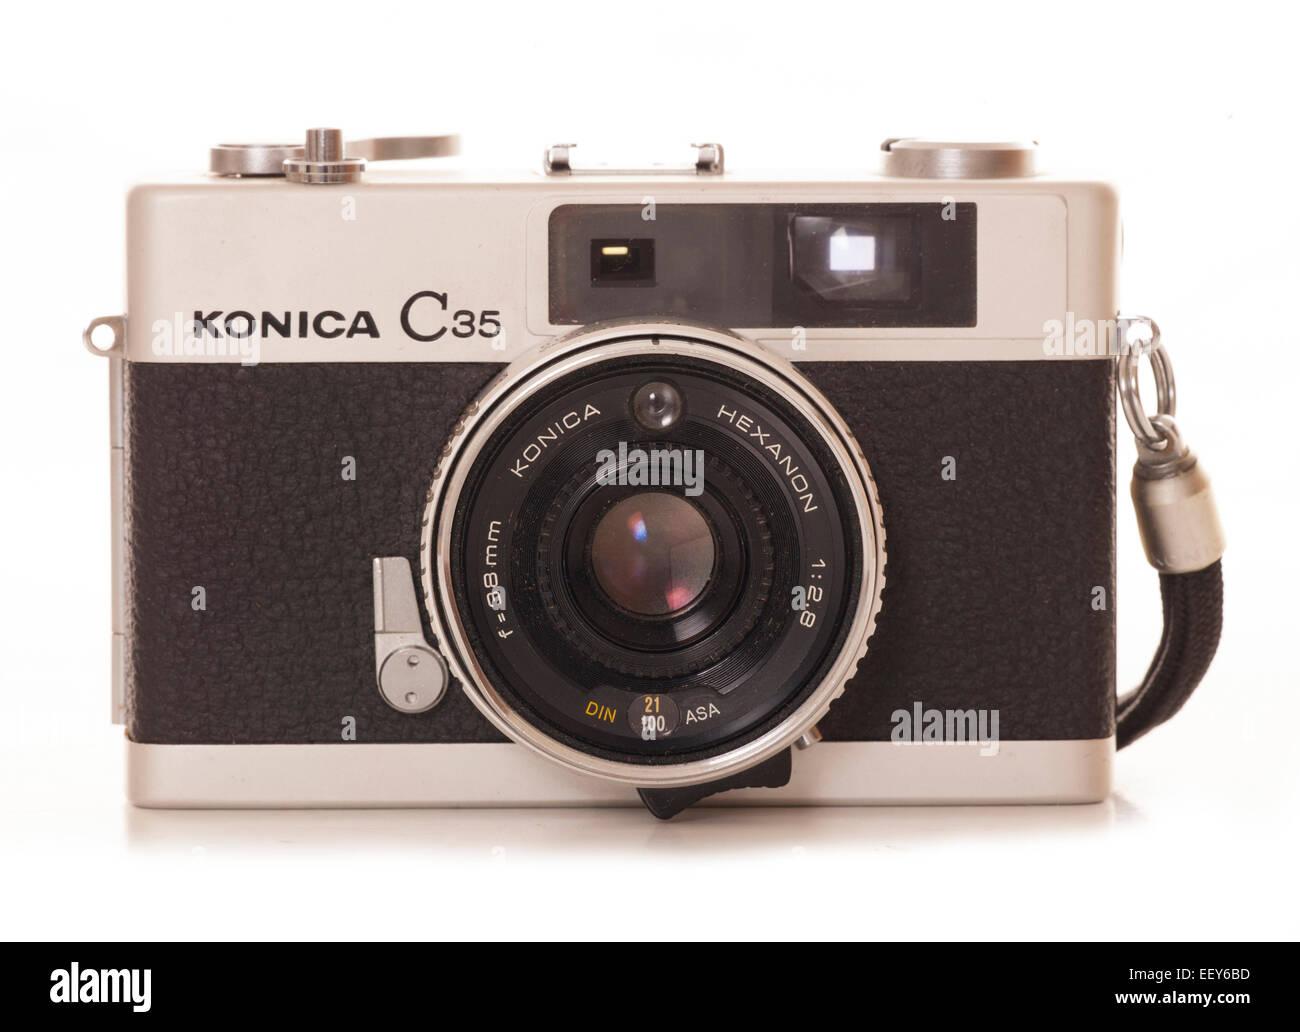 konica c35 camera film camera cutout - Stock Image